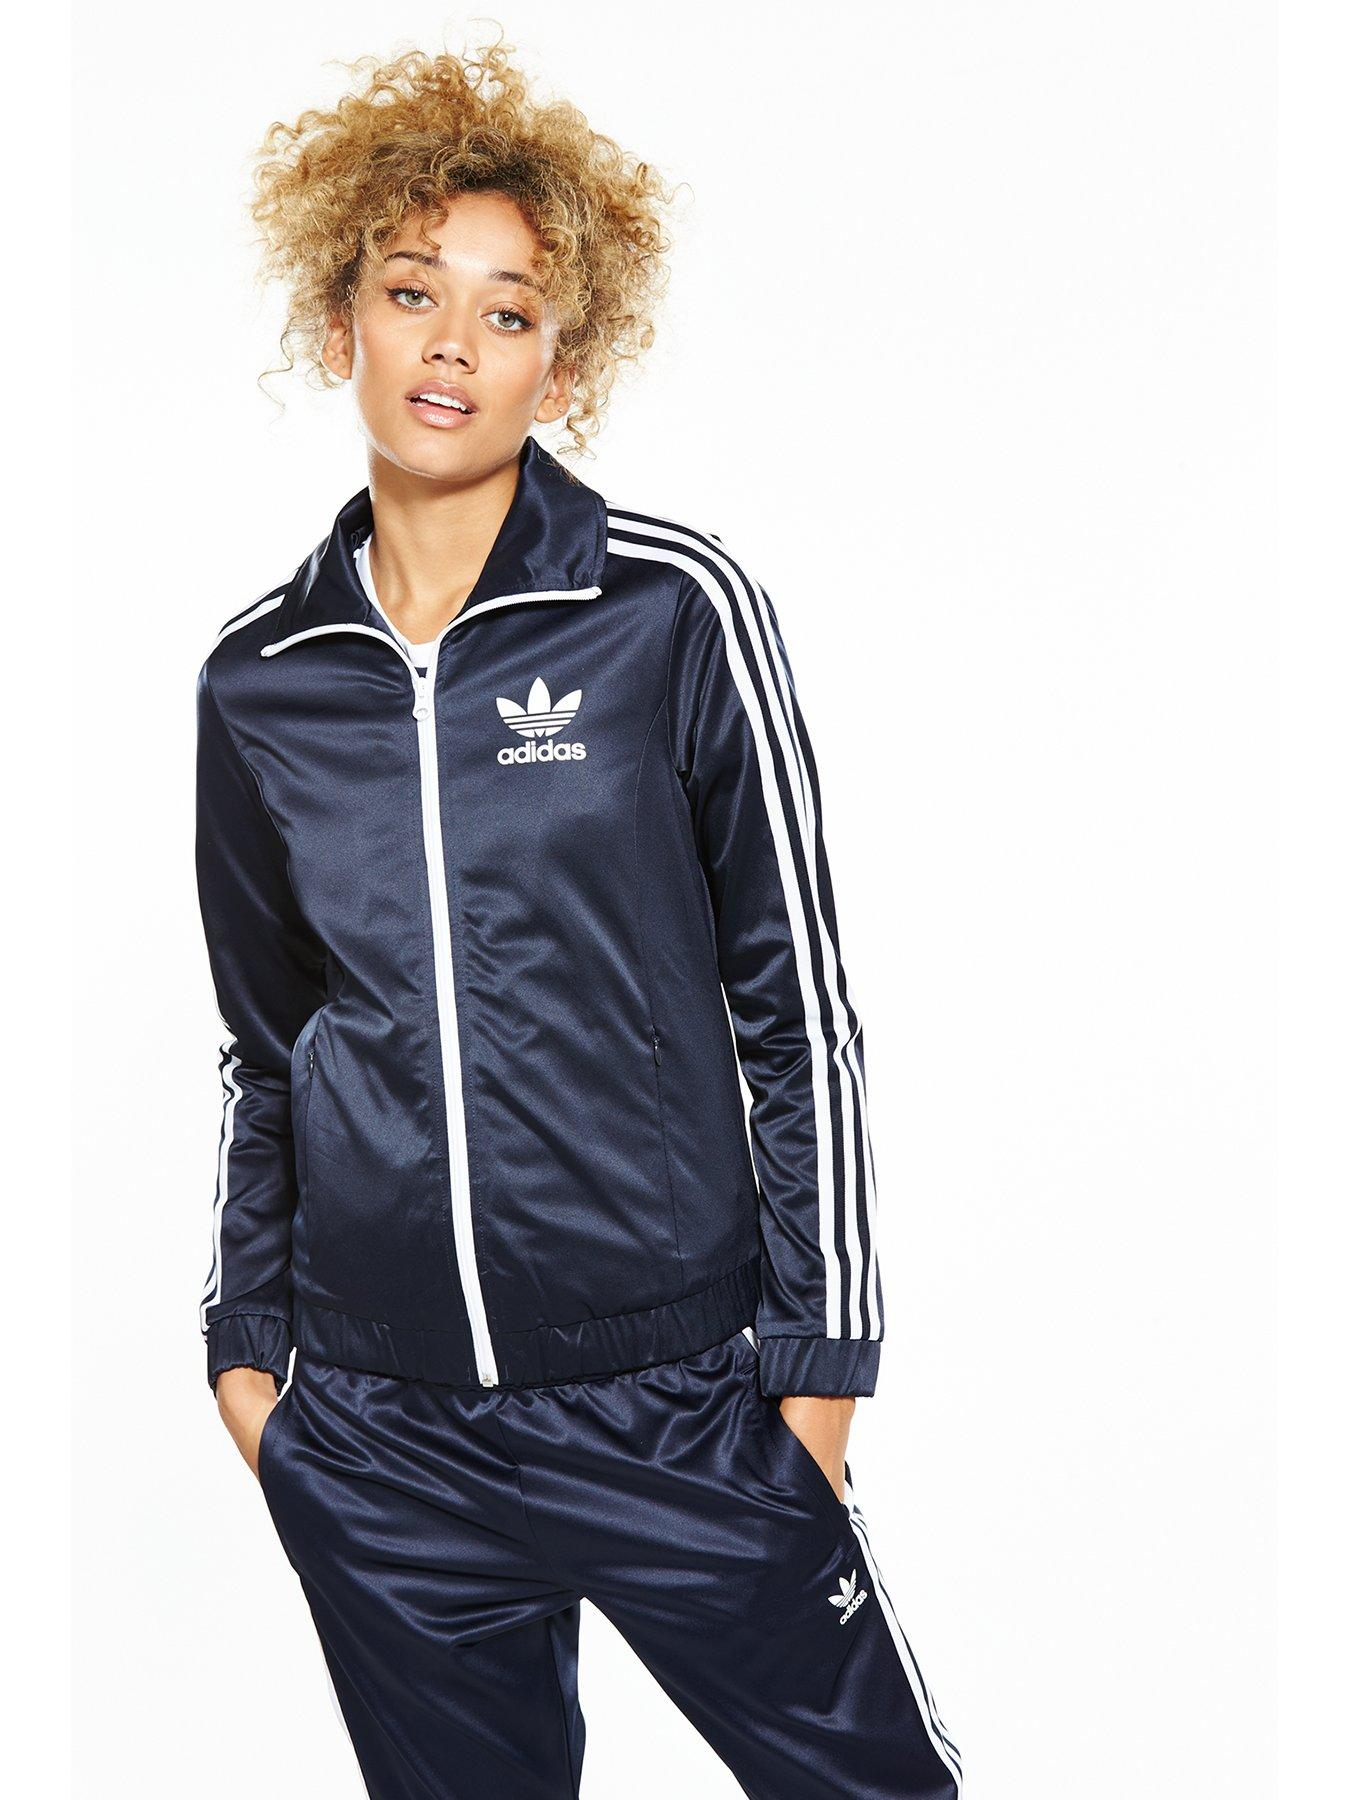 Adidas originals europa jacke